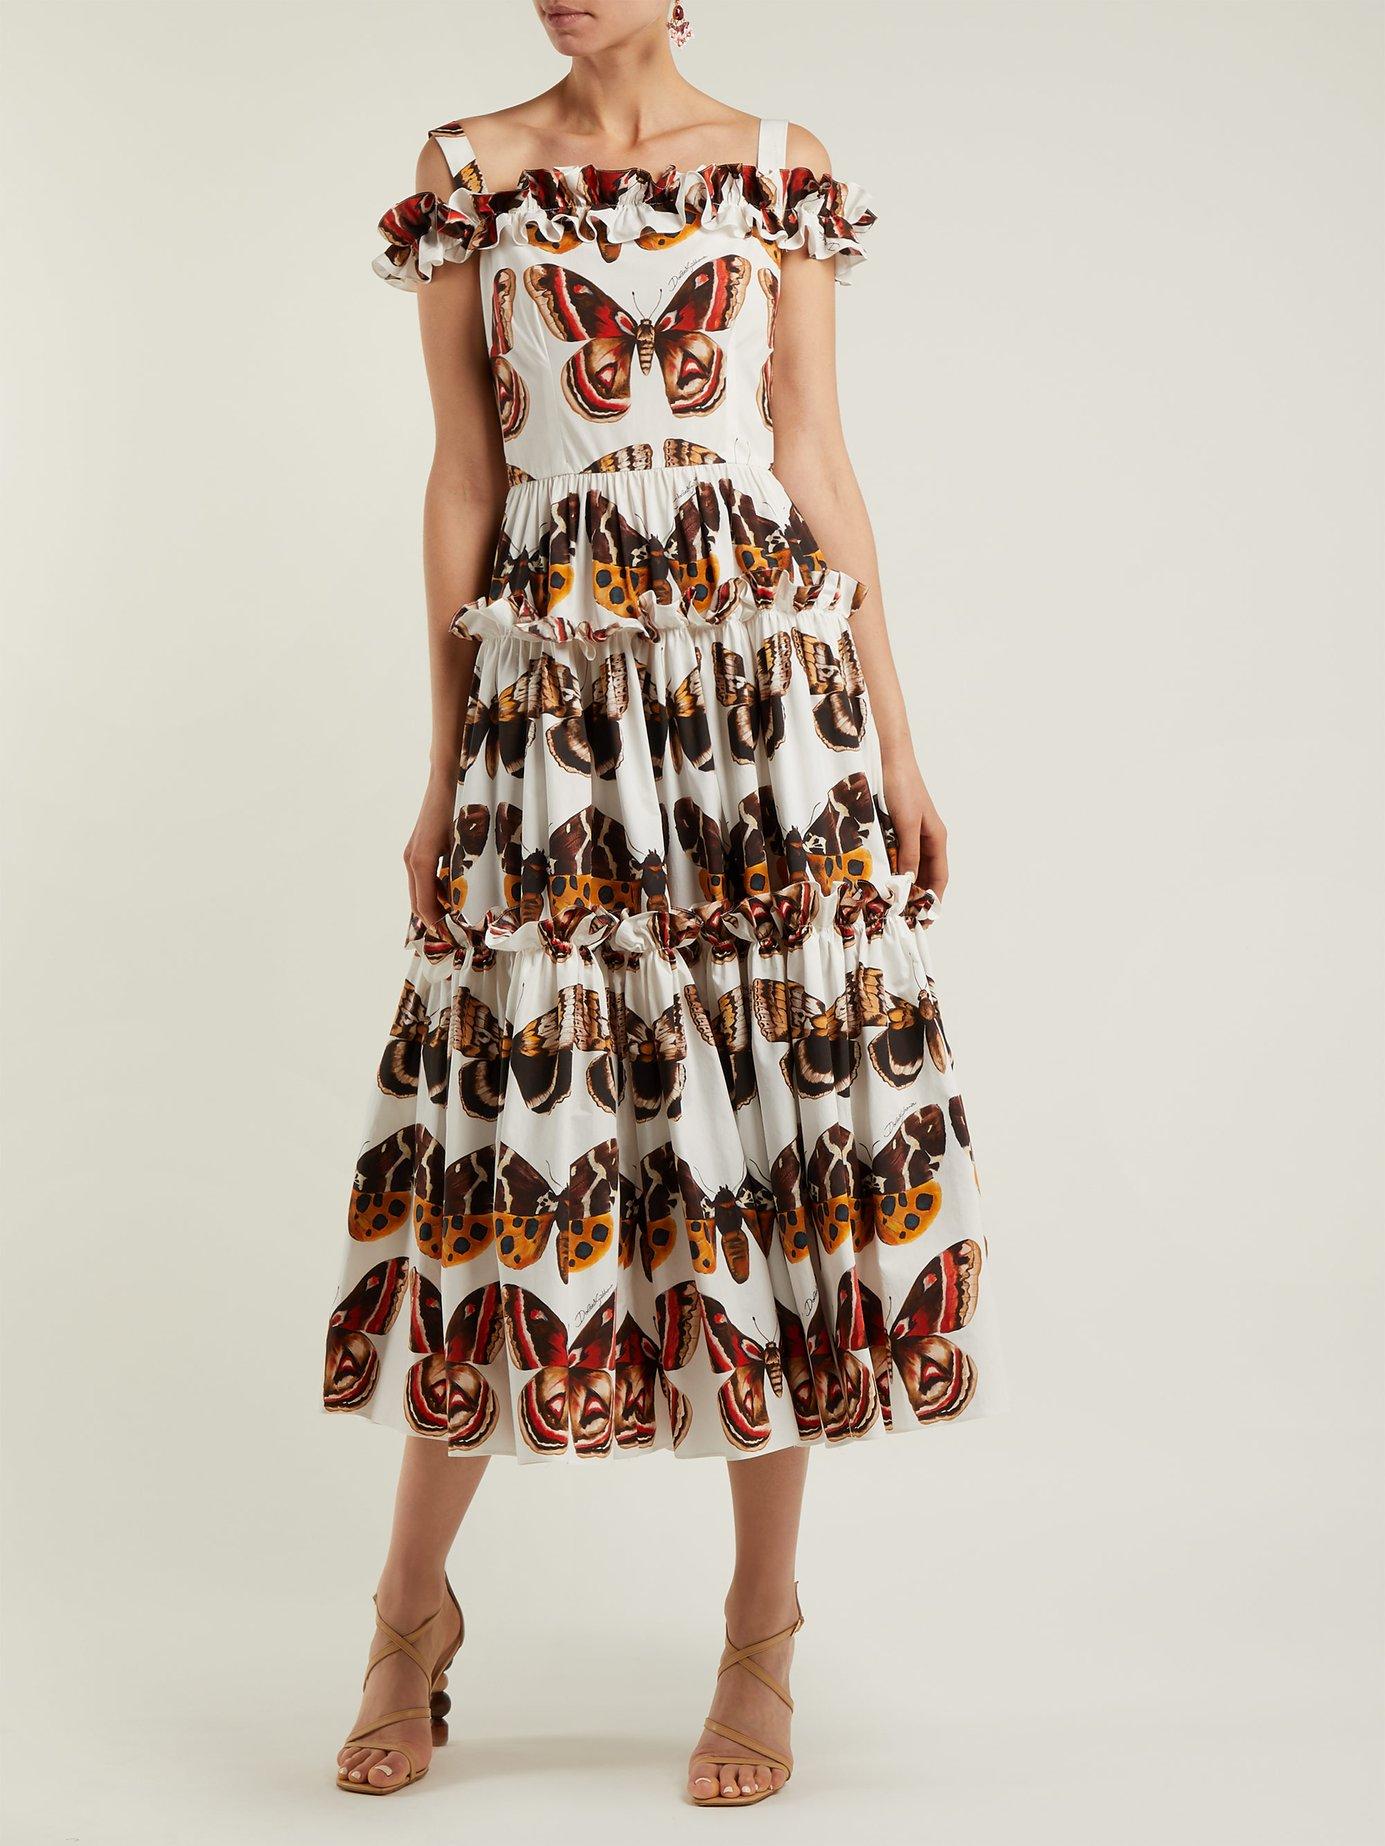 Butterfly-print cotton-poplin dress by Dolce & Gabbana